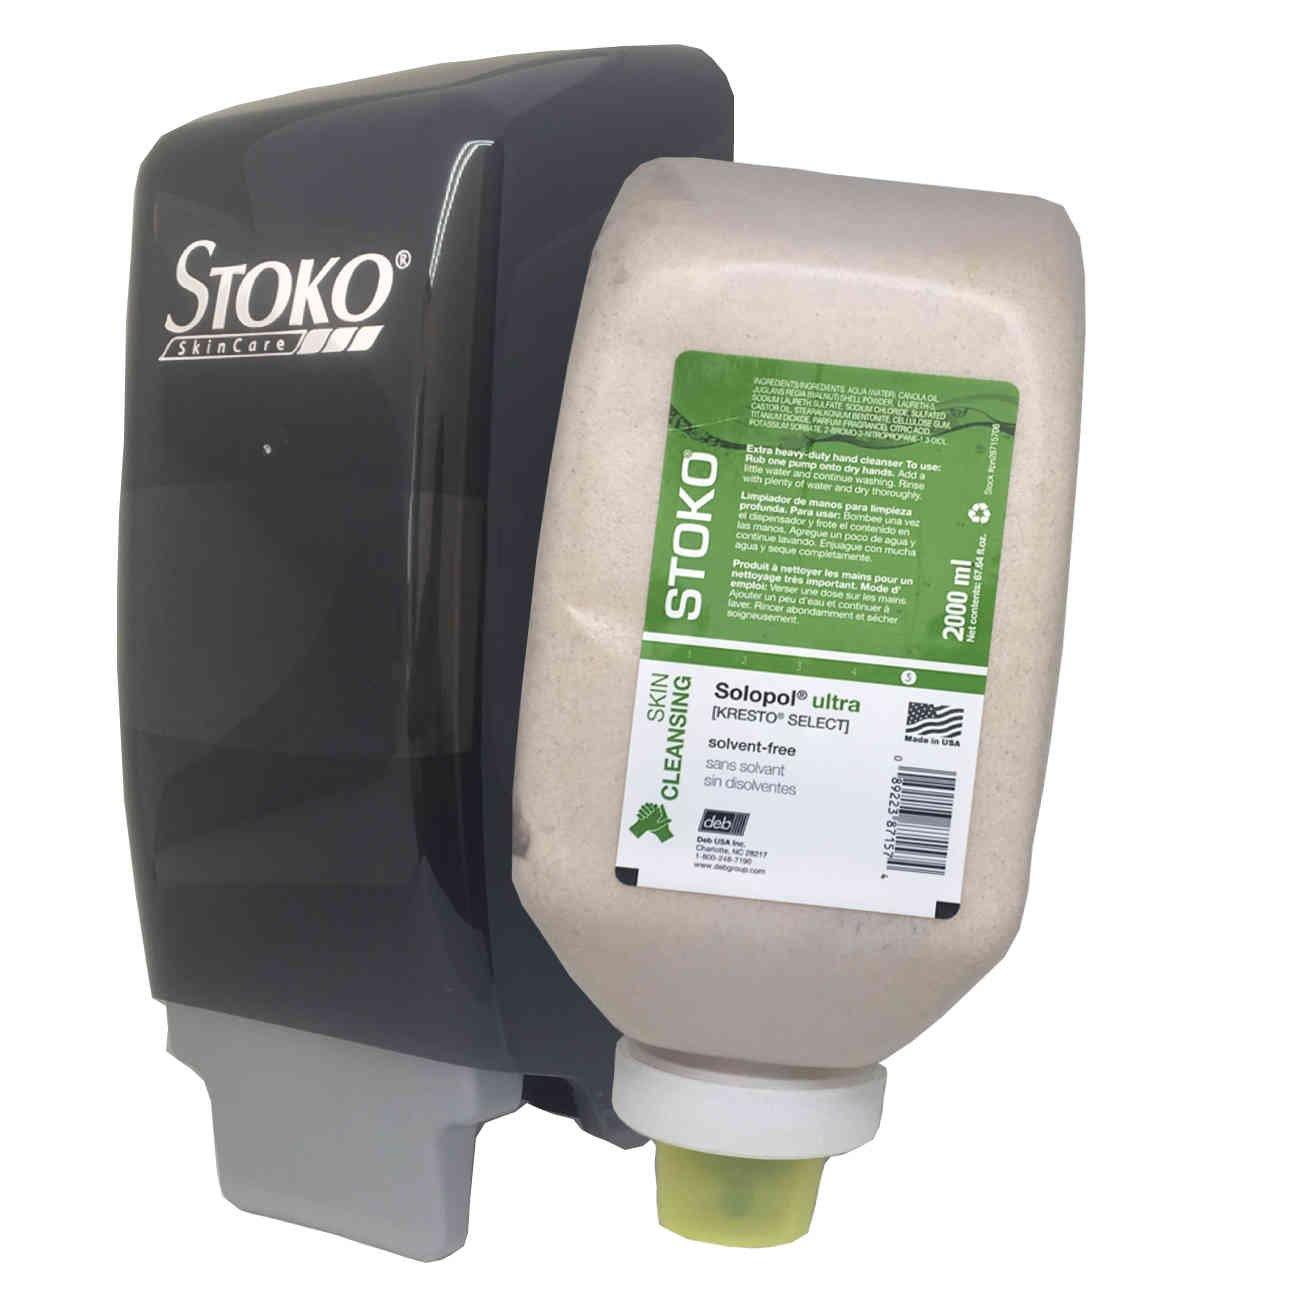 Solopol Ultra [Kresto Select] 2L Softbottle (PN28715706) + Dispenser (PN5598086) Combo